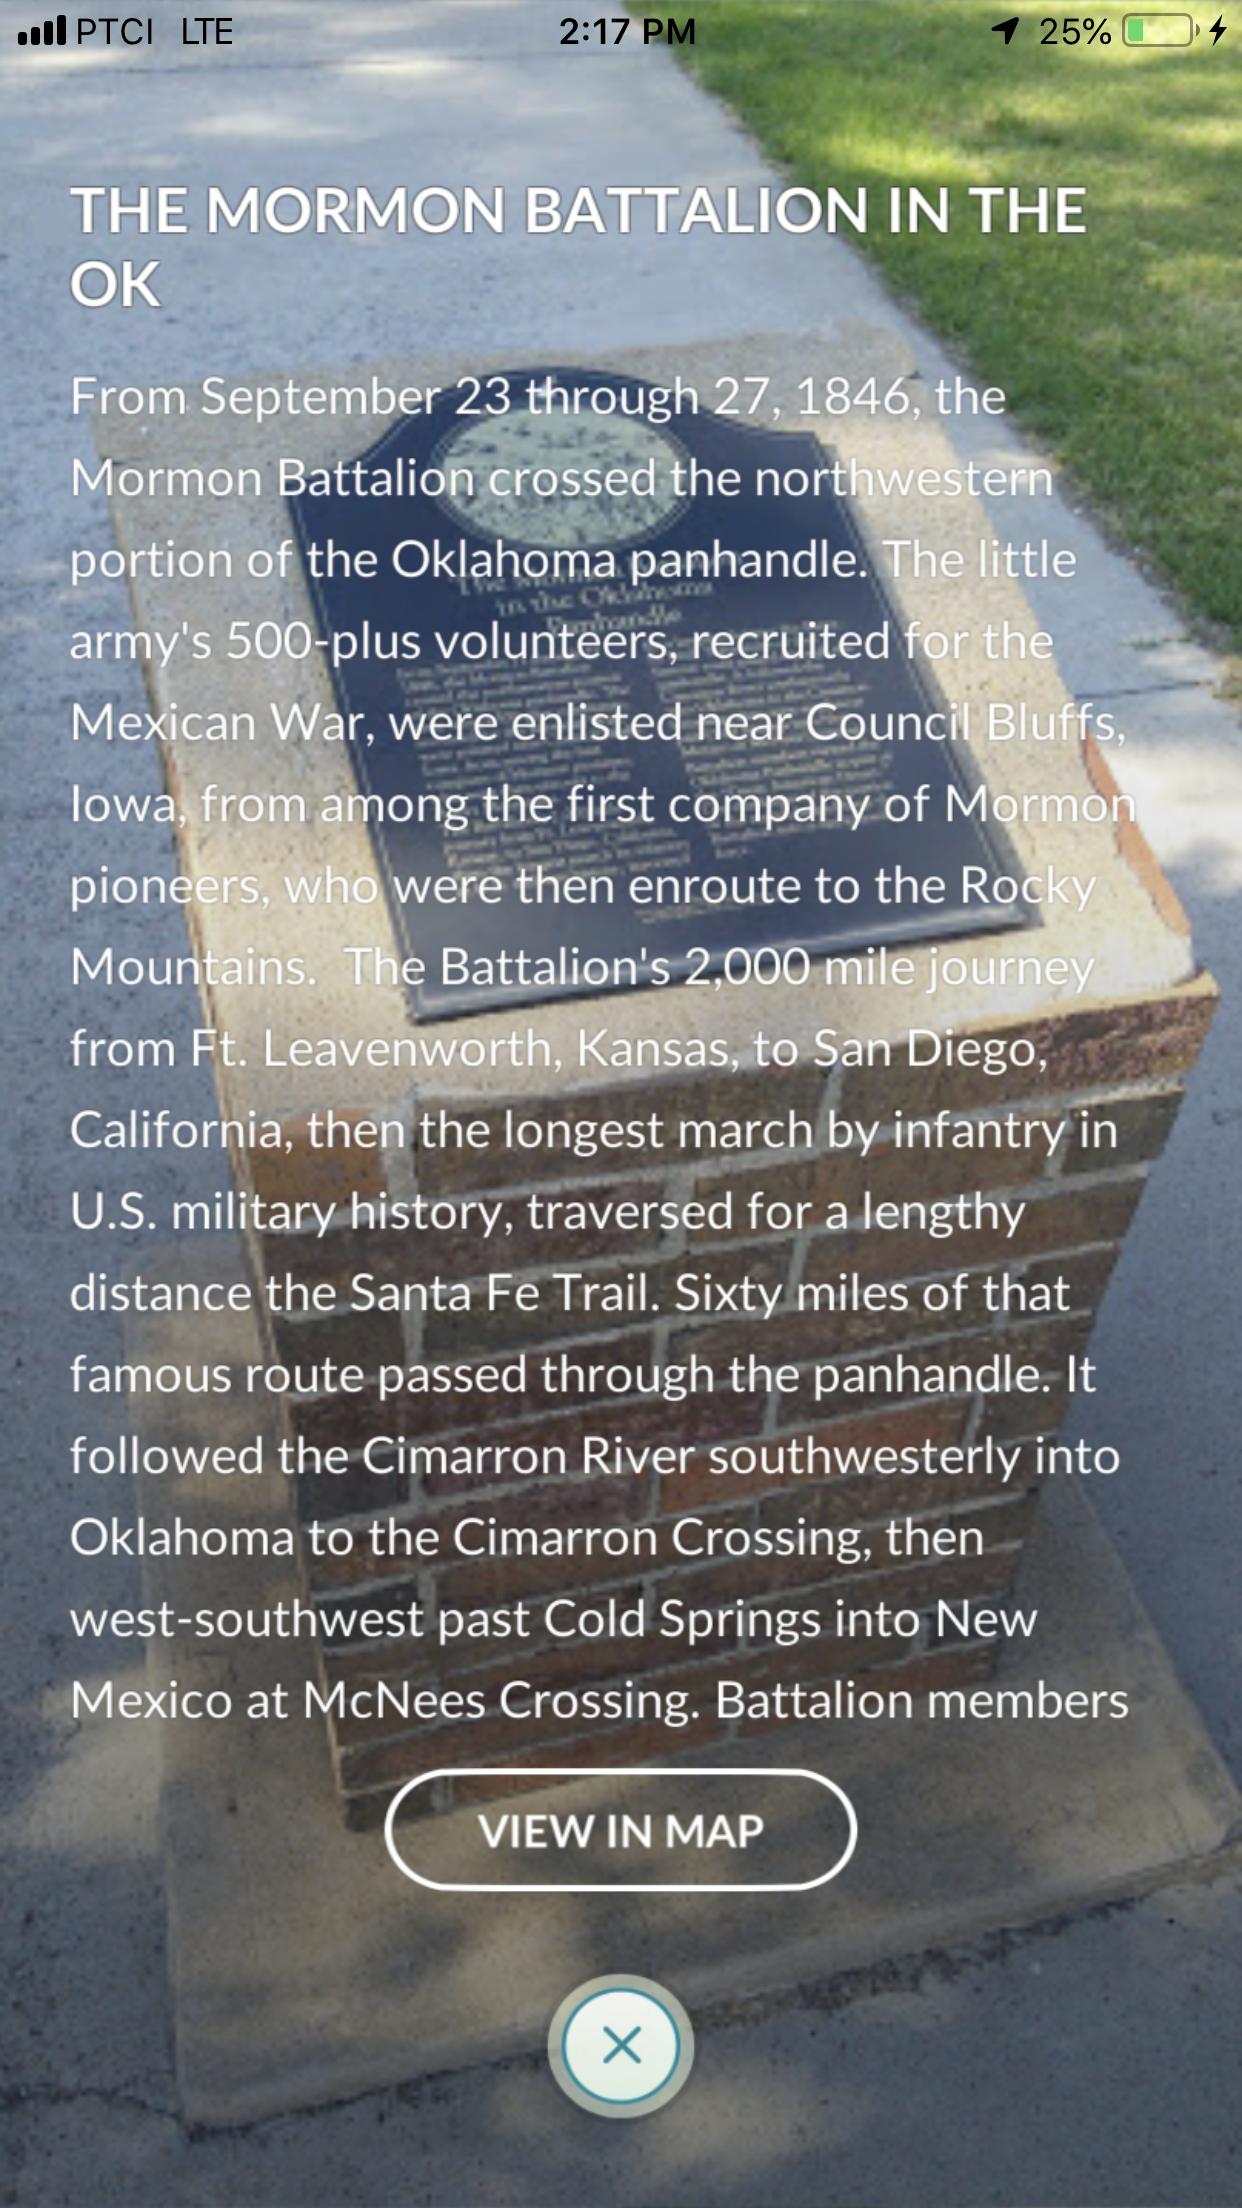 Oklahoma Mexican war, Mormon battalion, Pokestop